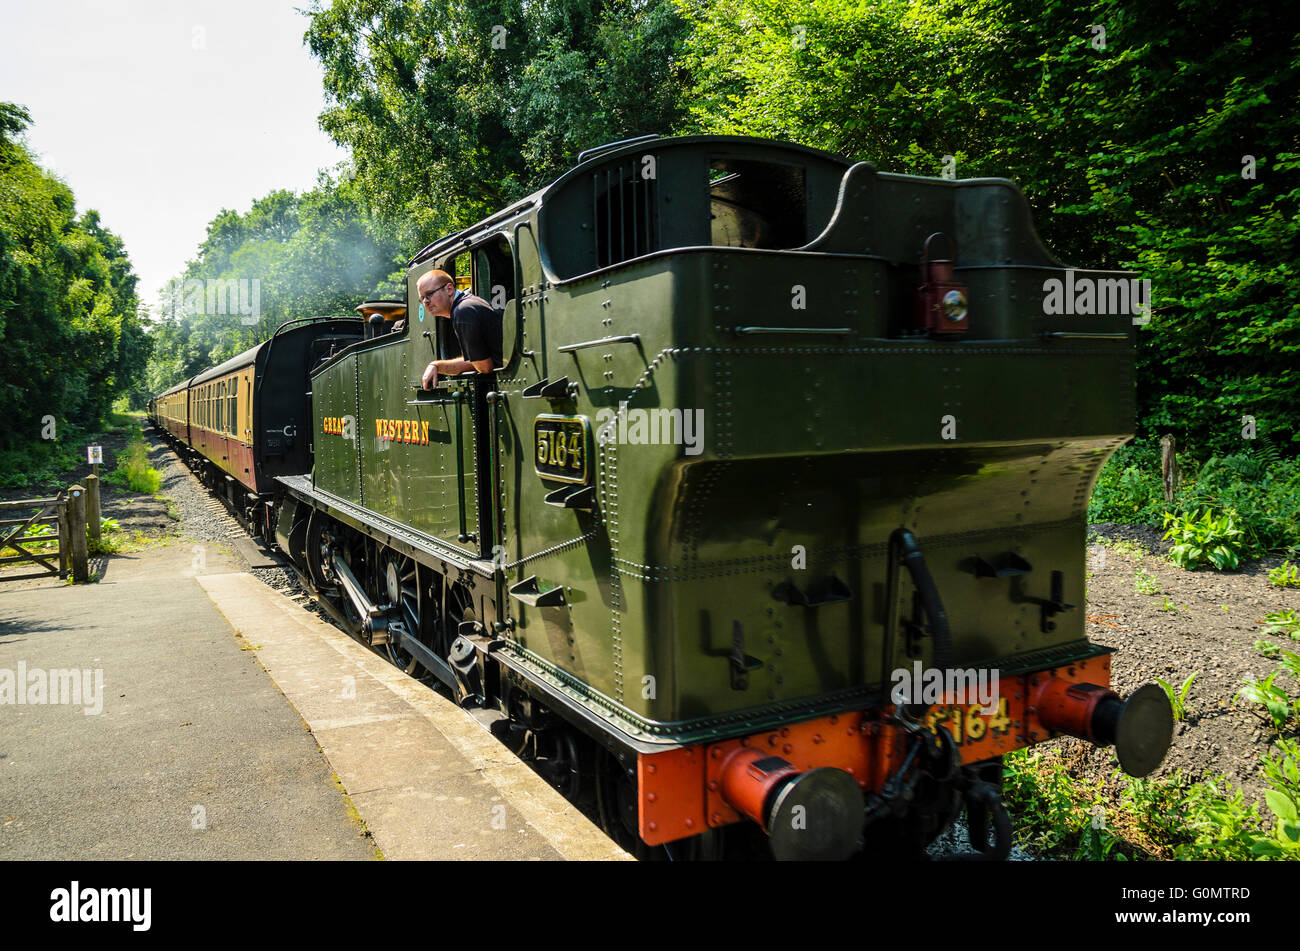 Ex-Great Western Railway serbatoio del motore n. 5164 traina un treno in Severn Valley Railway in Shropshire Inghilterra Immagini Stock